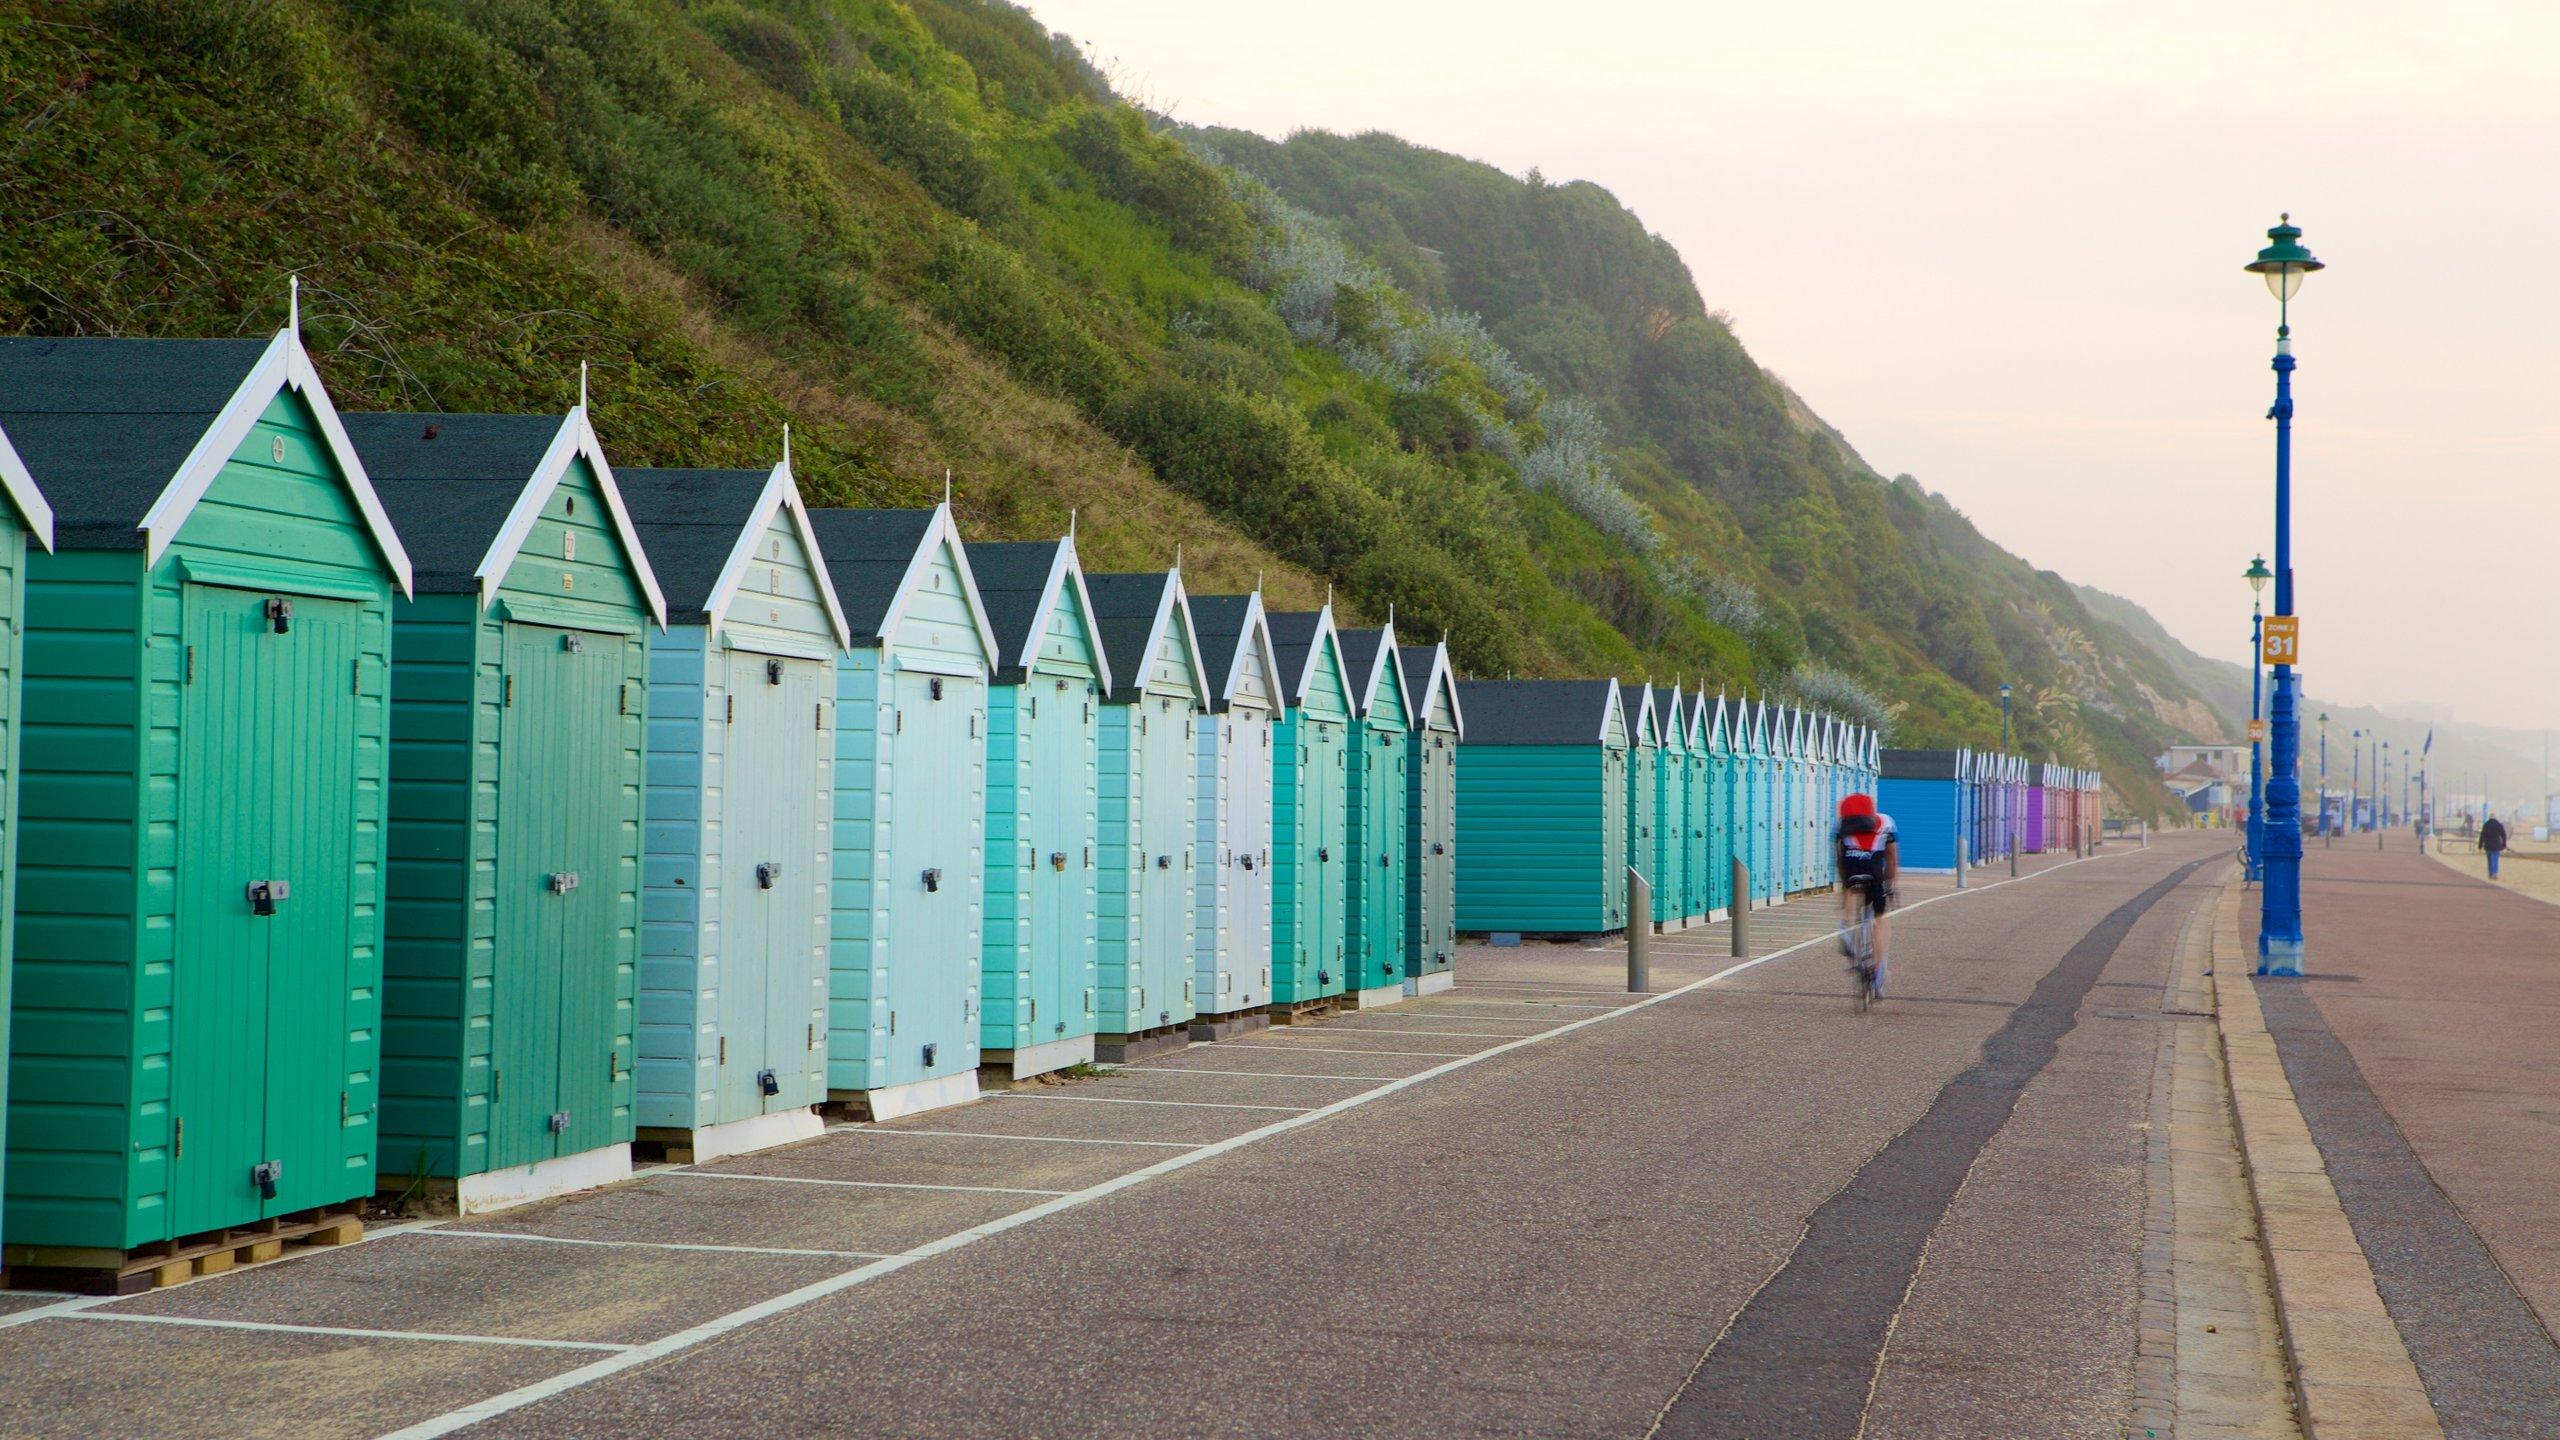 Bournemouth Beach, Bournemouth, England, United Kingdom